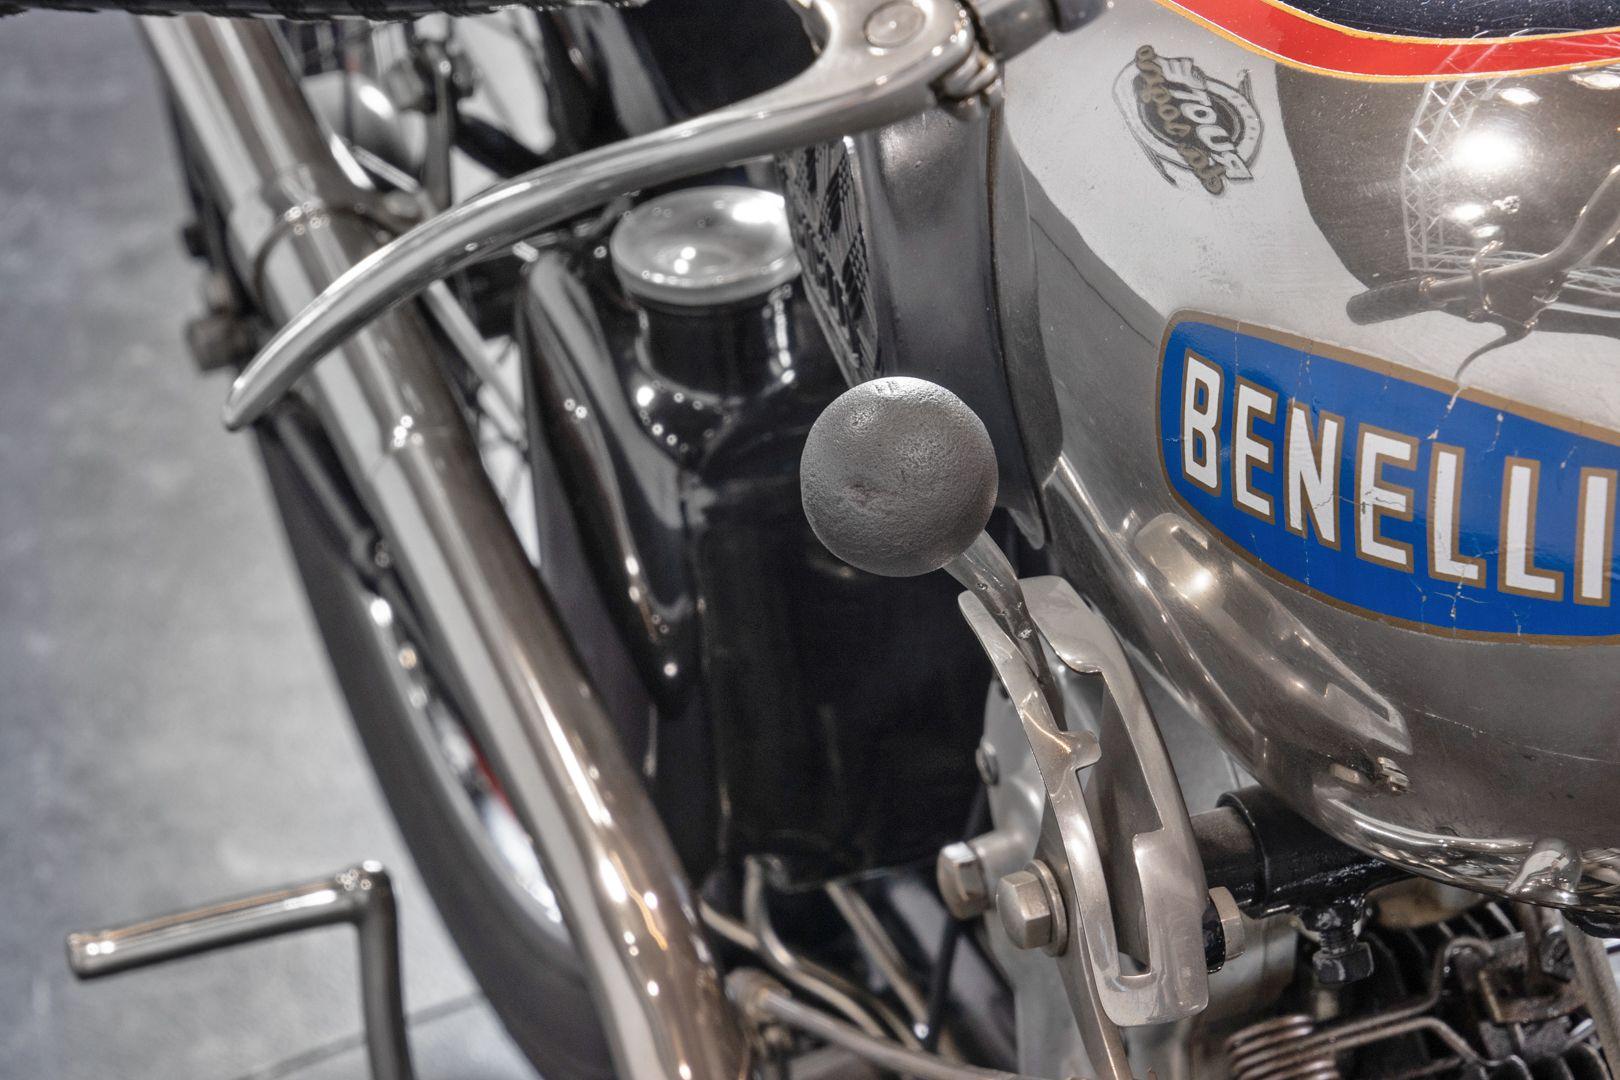 1934 Benelli 220 Sport 74378